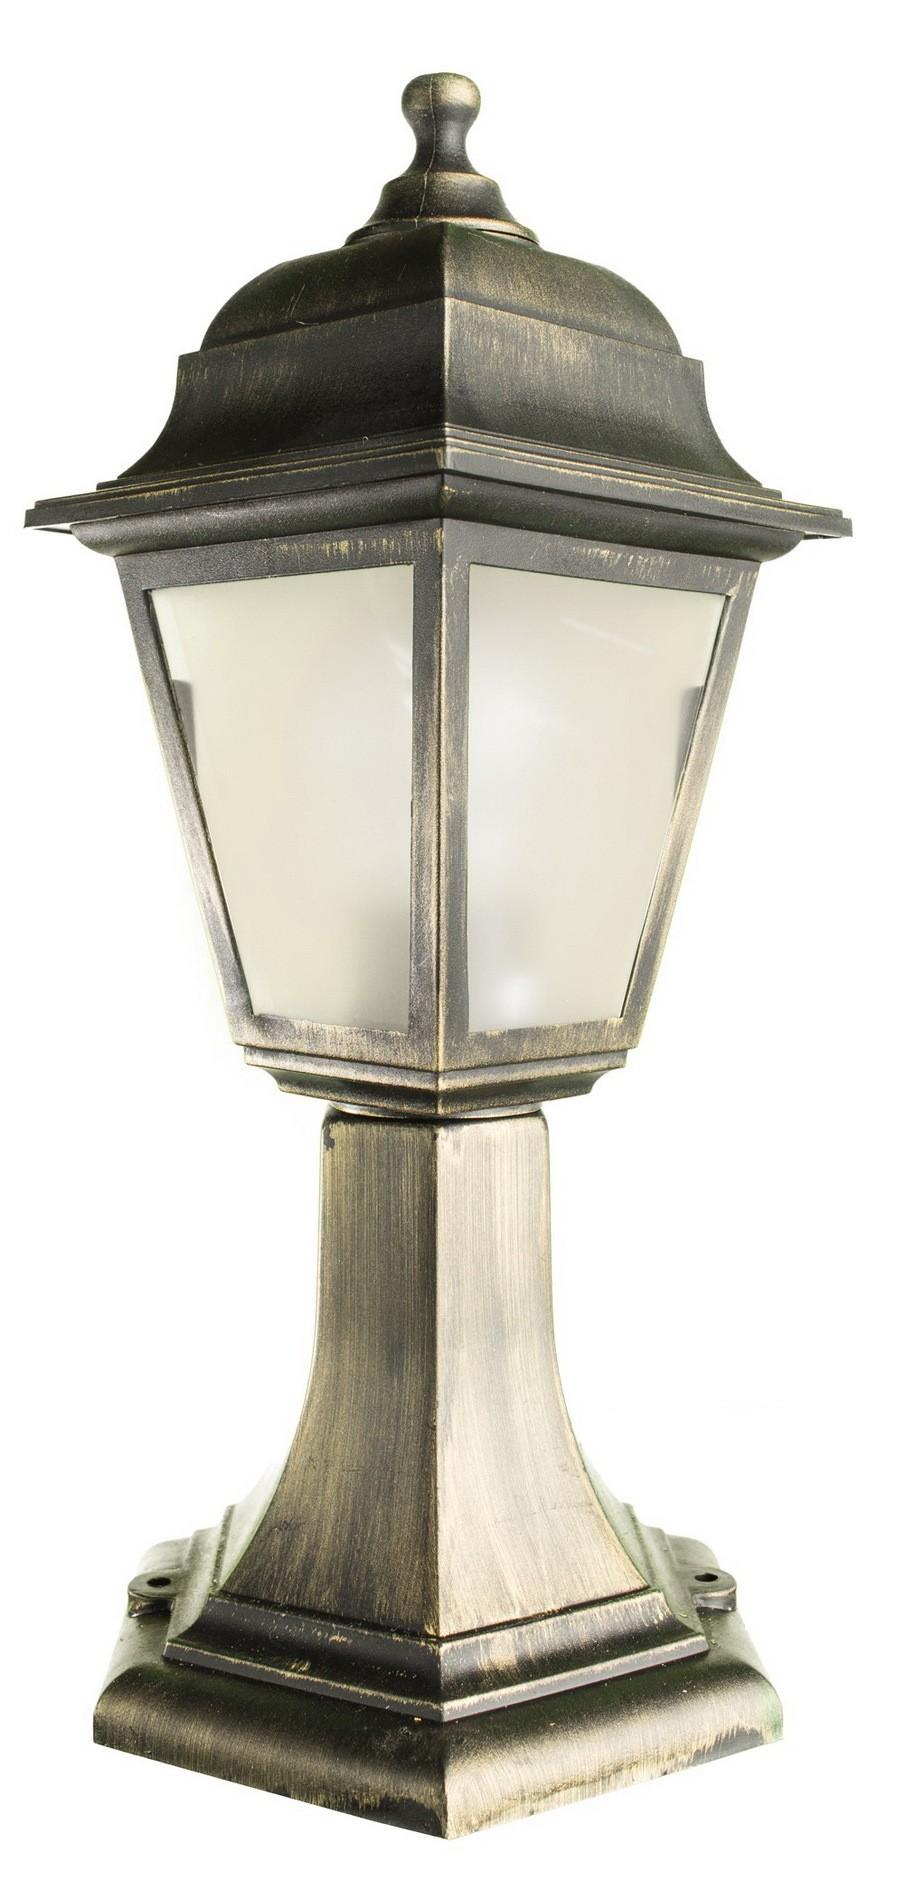 Светильник уличный Arte lamp A1117fn-1br